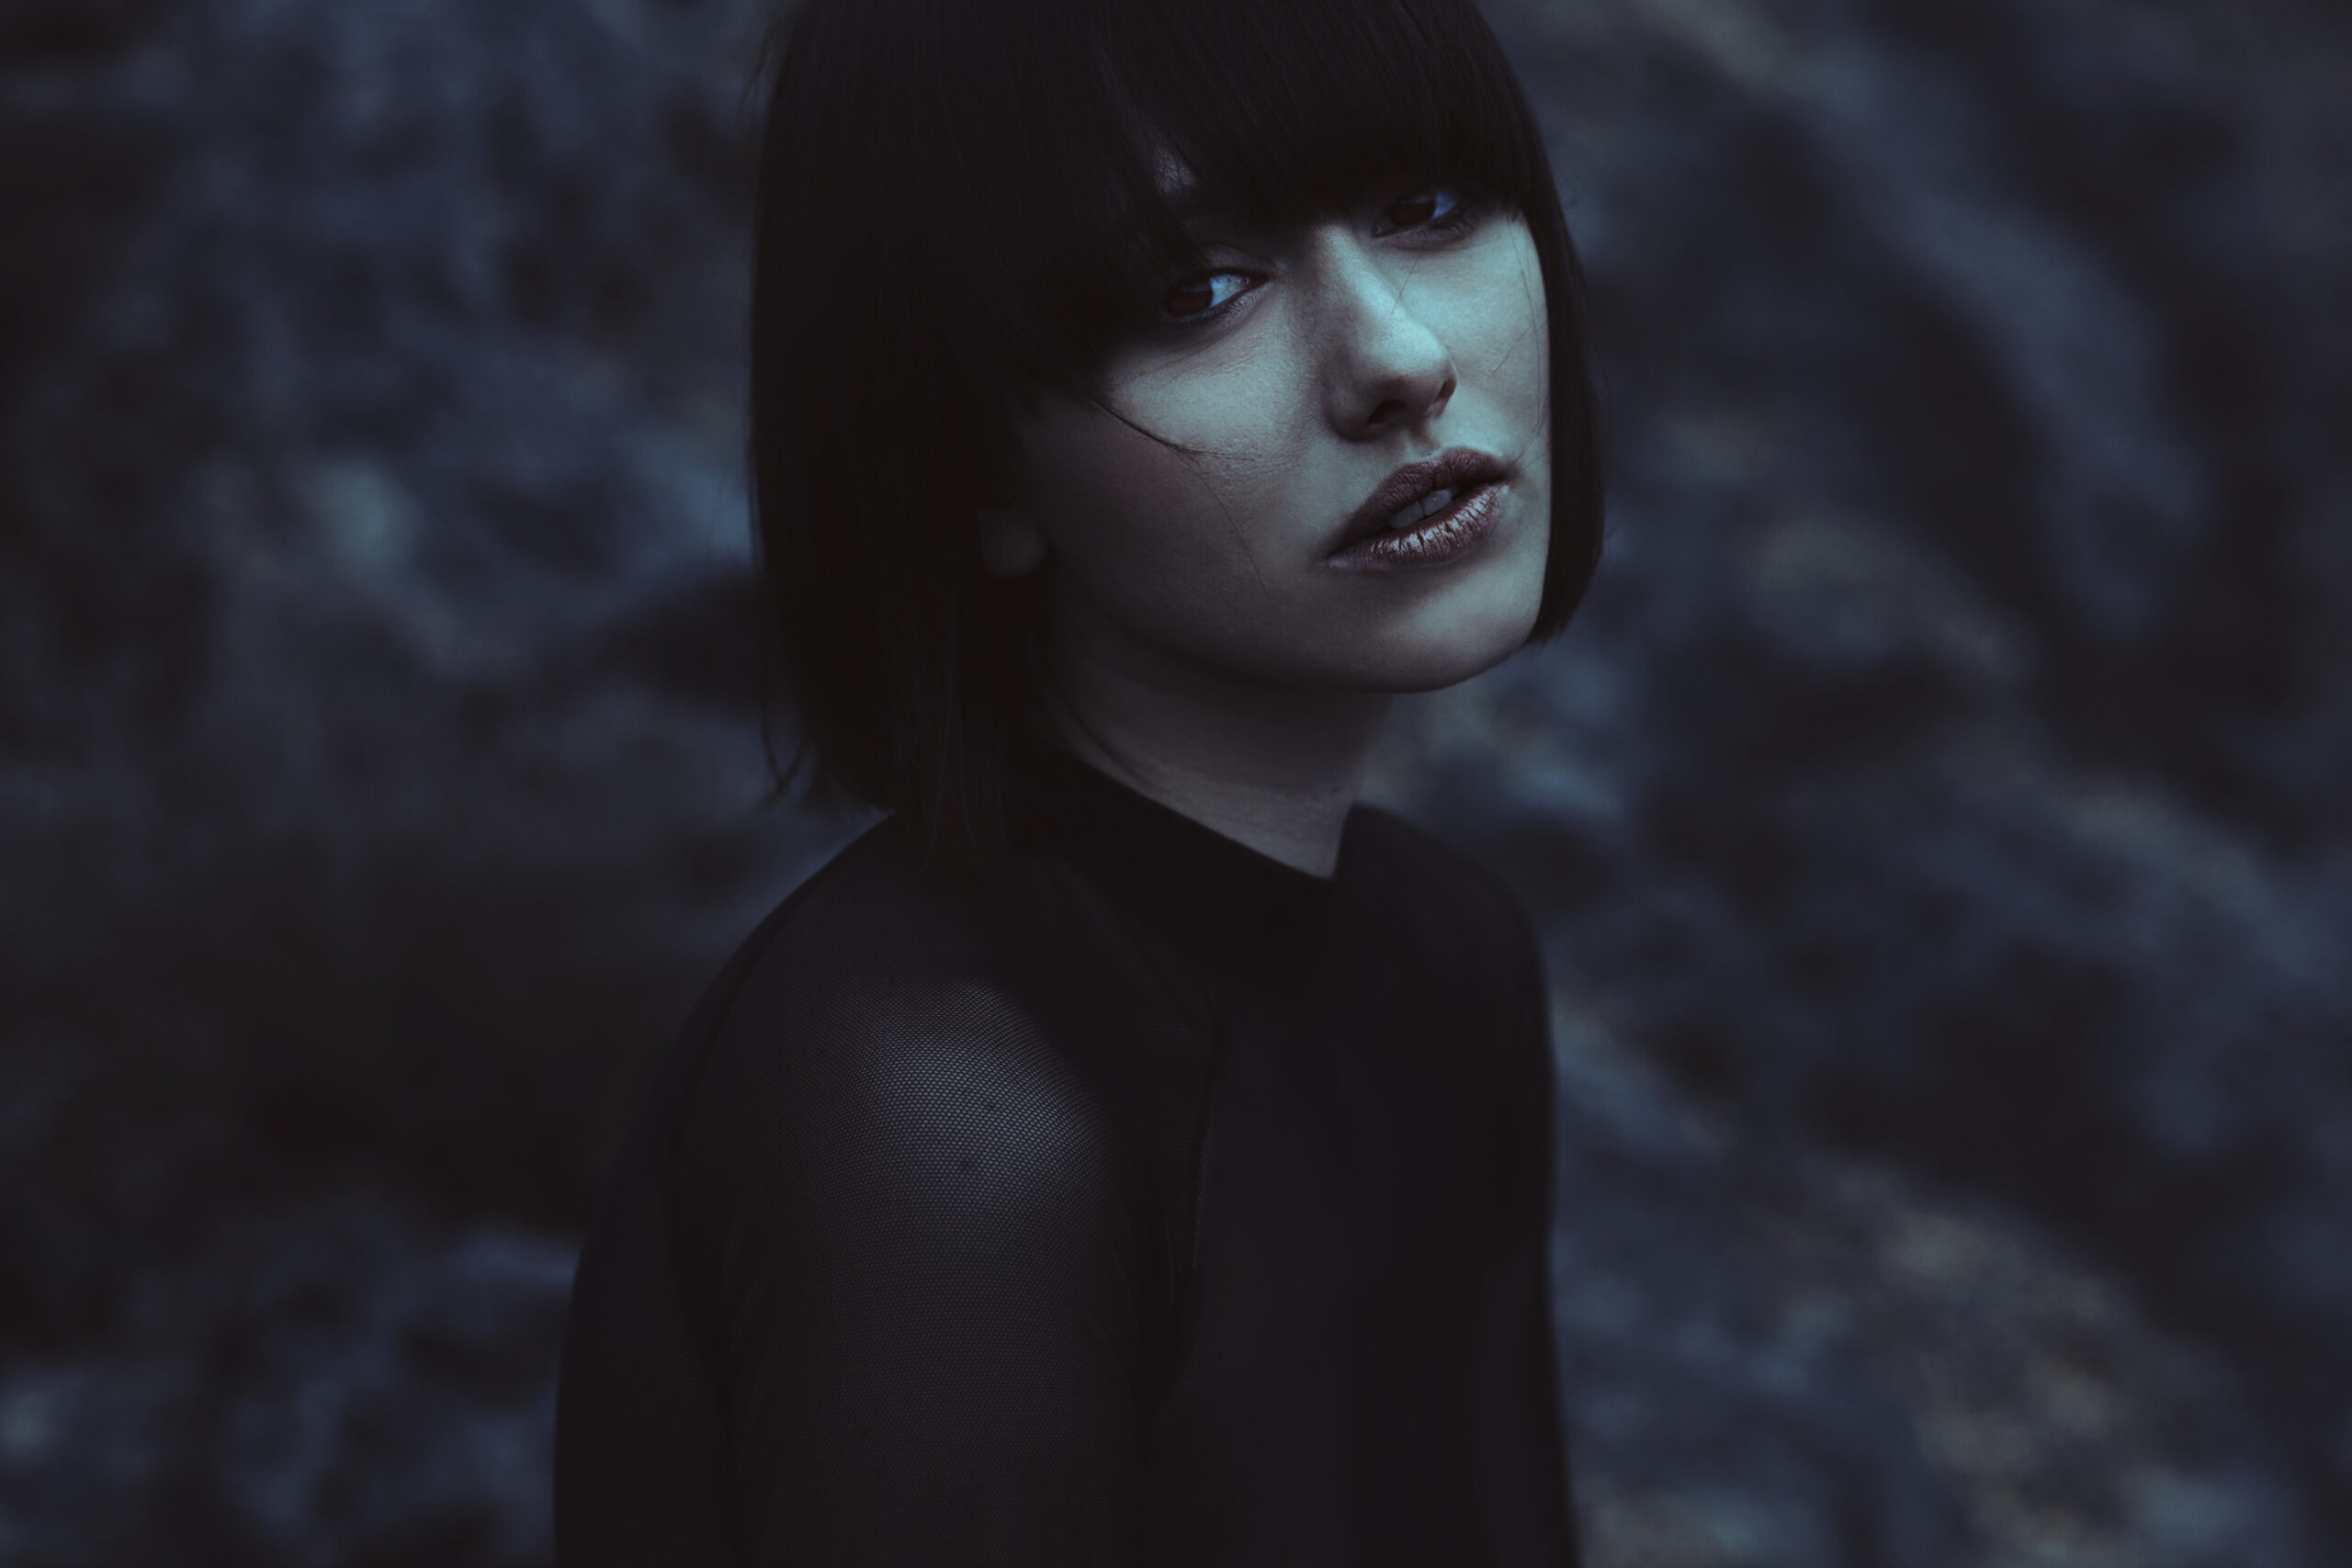 Sara Mun Weronikka Duszynski FineArt